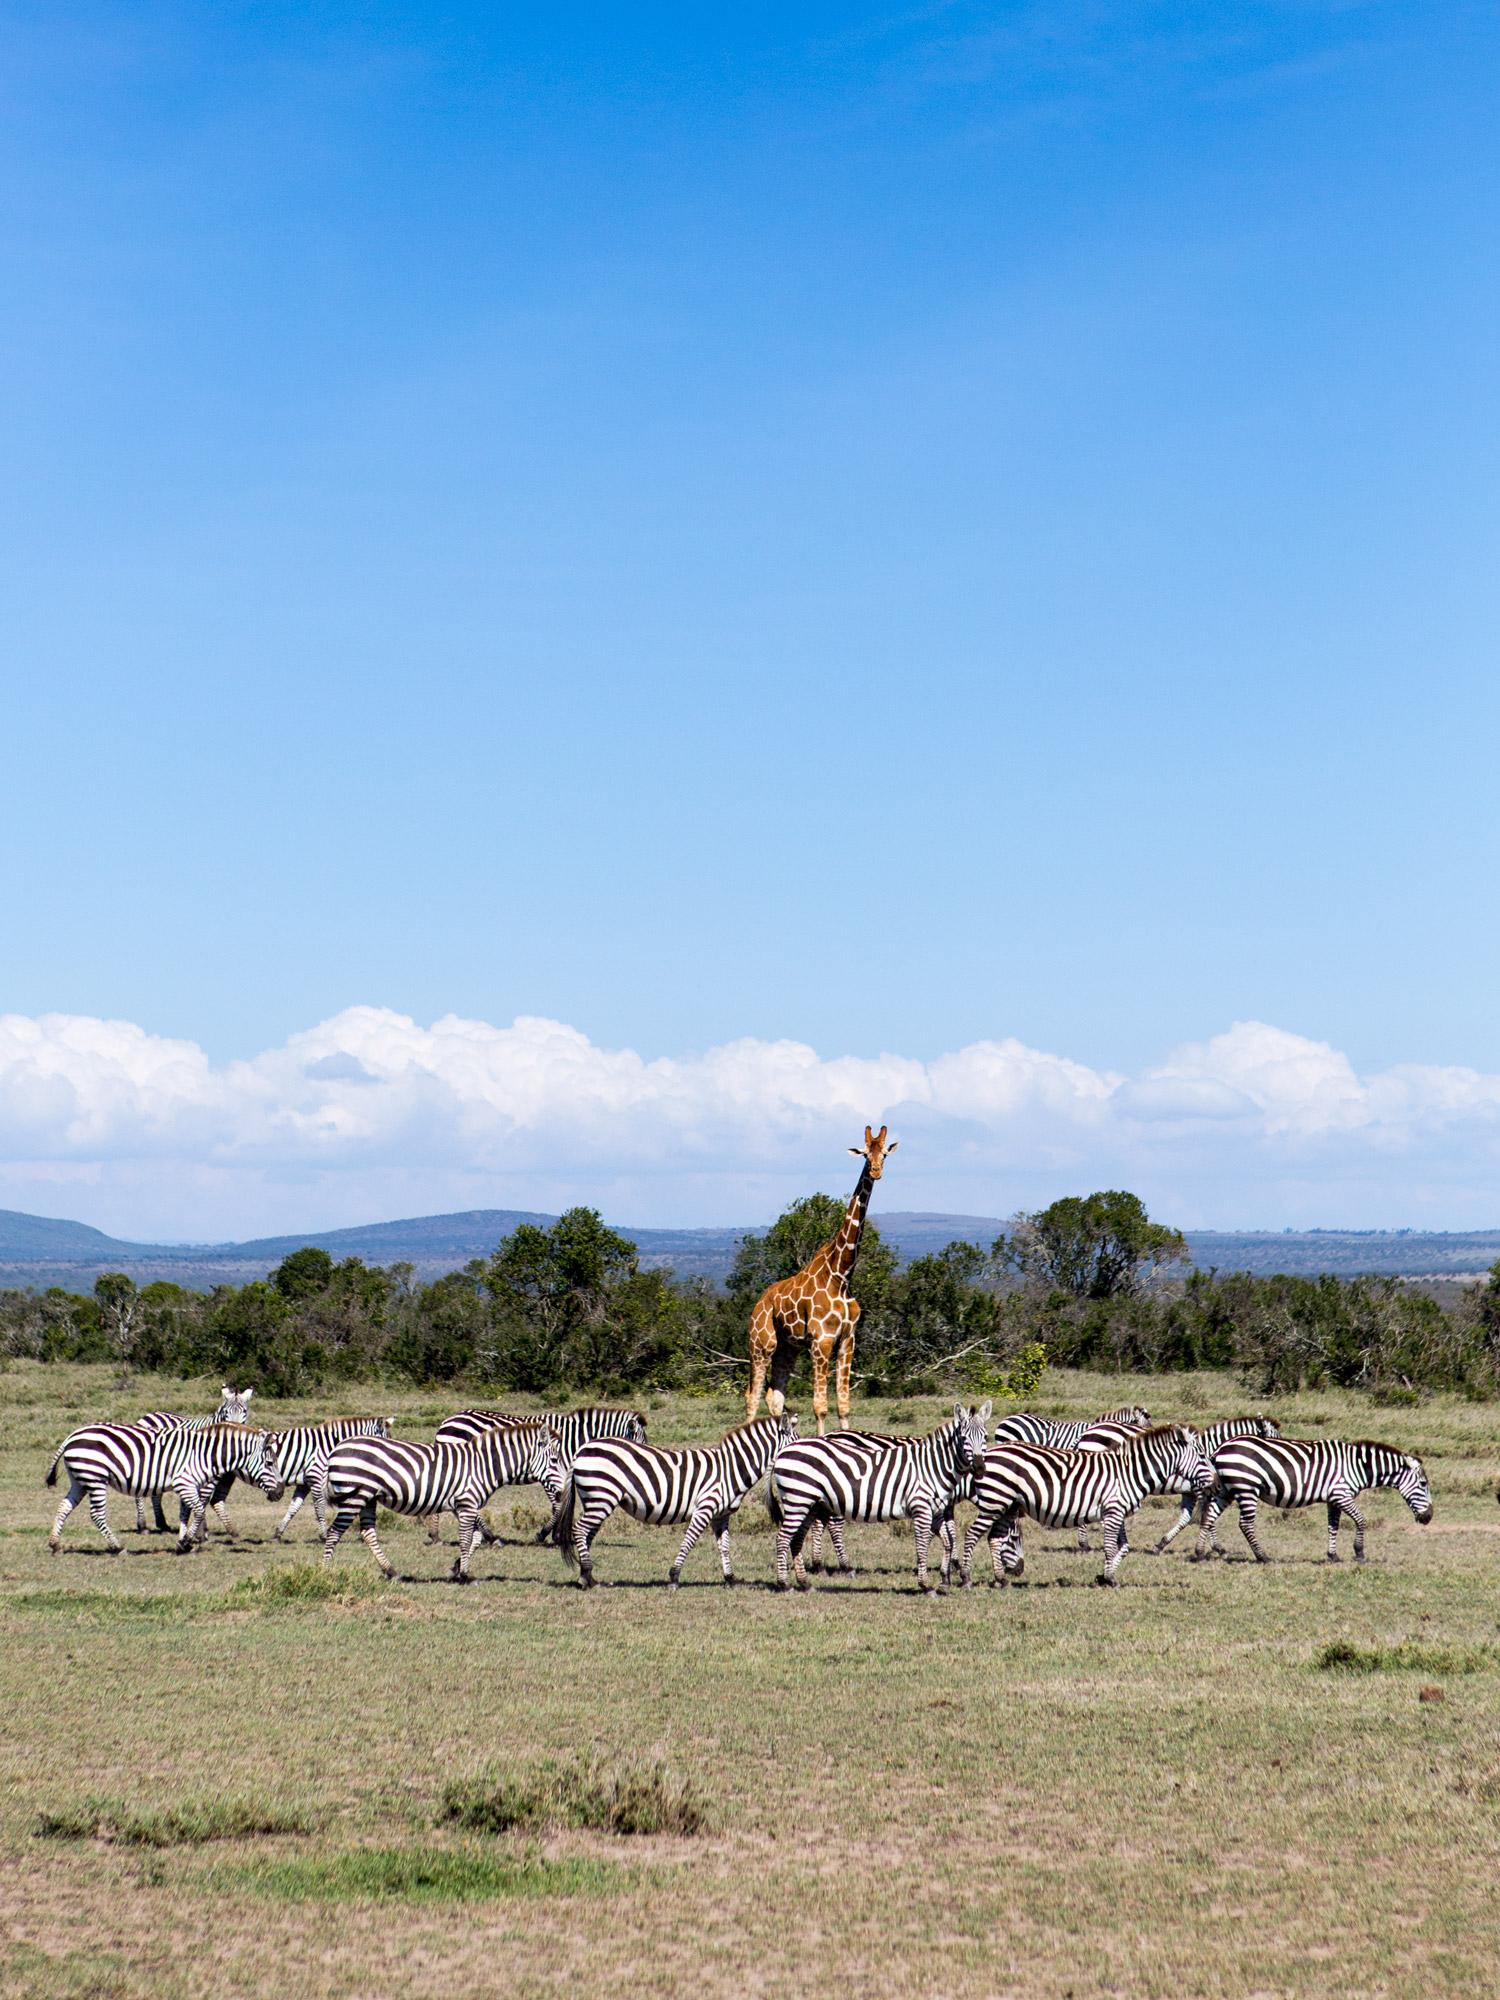 On the plains at our Safari Yoga Retreat